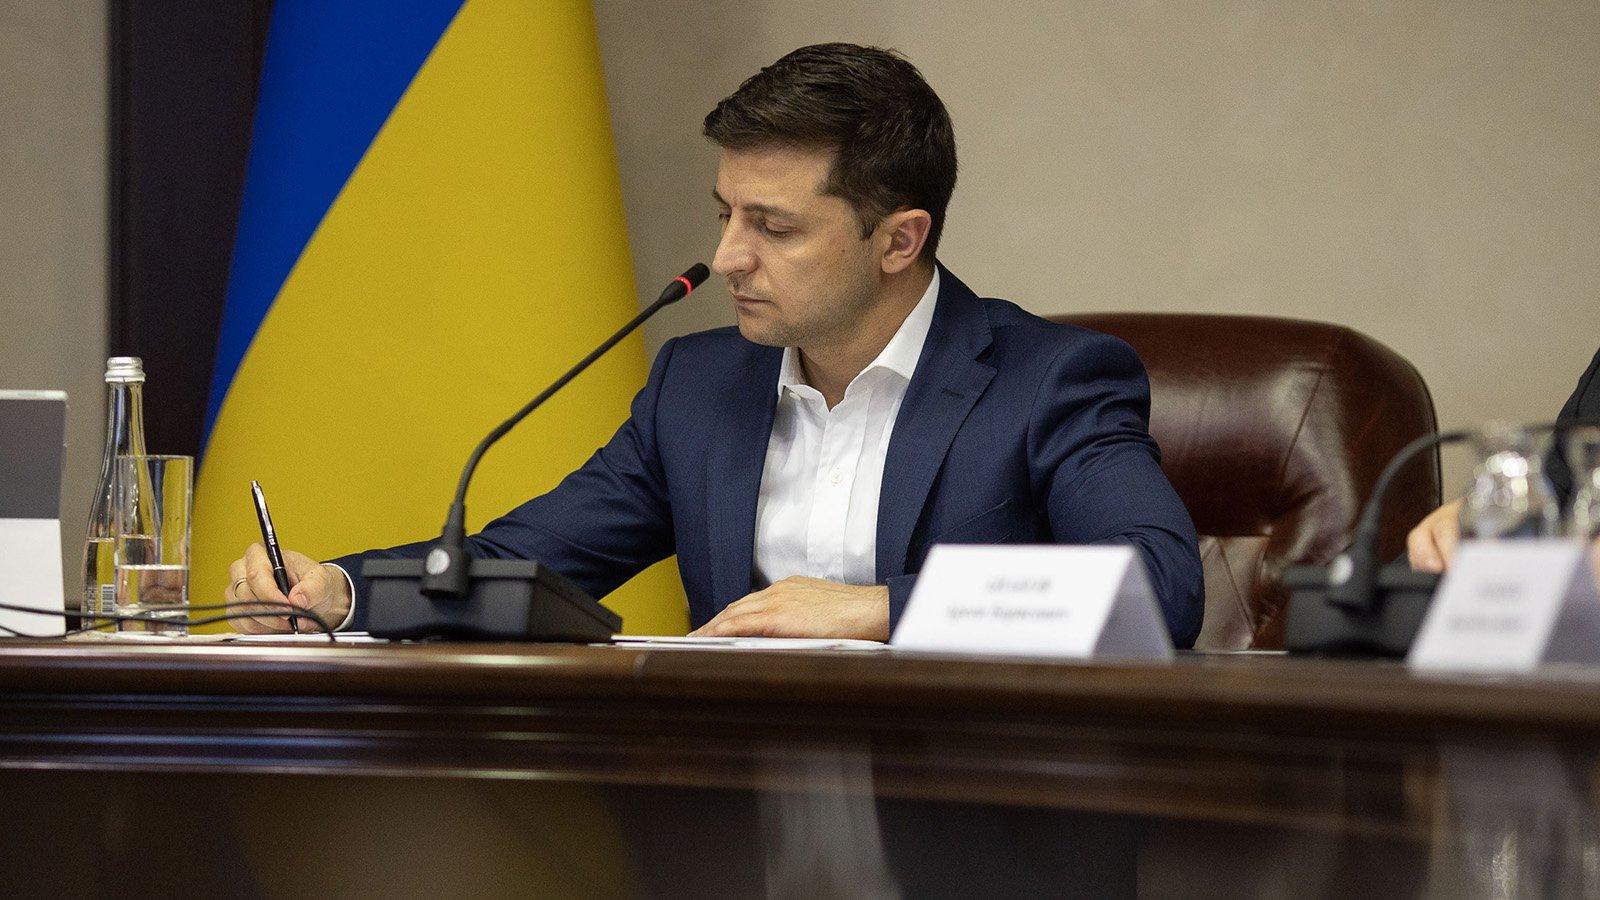 Зеленський призначив нового начальника Управління держохорони - Зеленський - orig 15628440703596cc60eeac92c6b2898aee701216f8